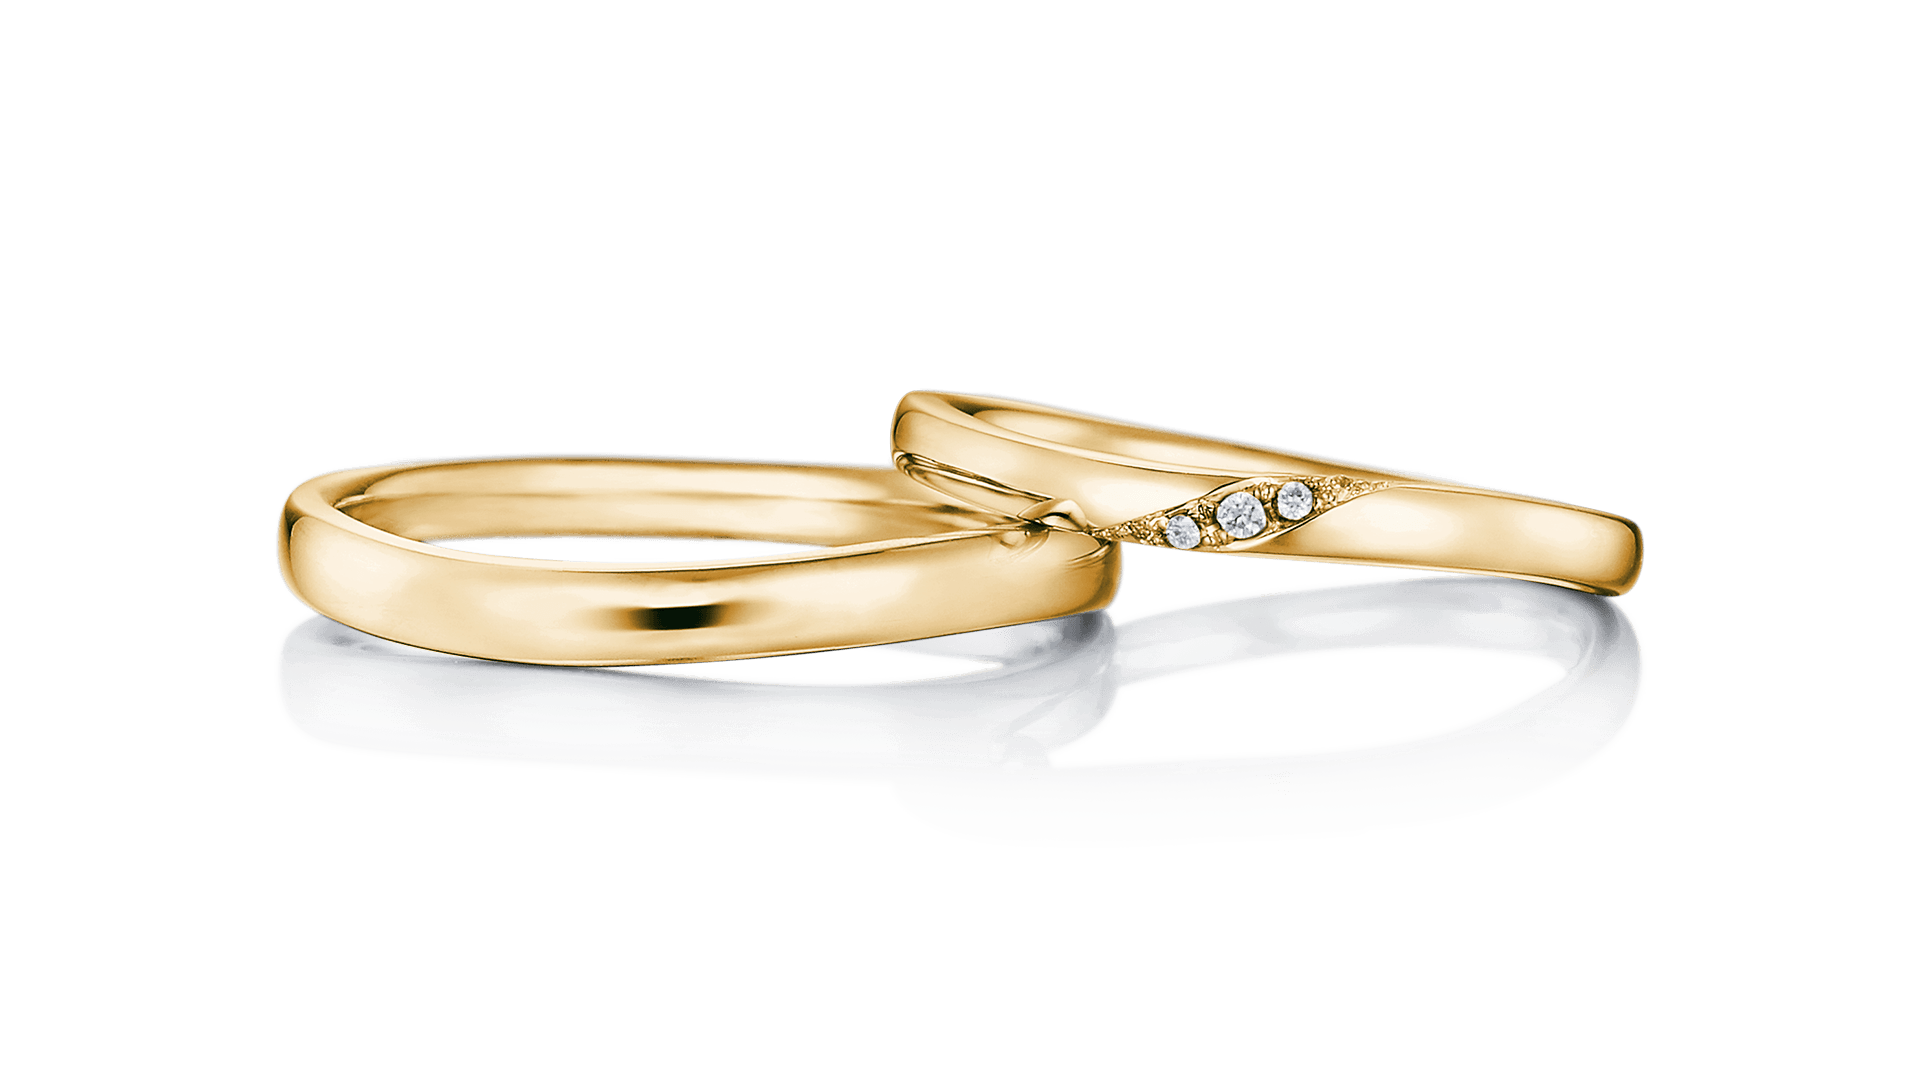 ceres ケレース | 結婚指輪サムネイル 1